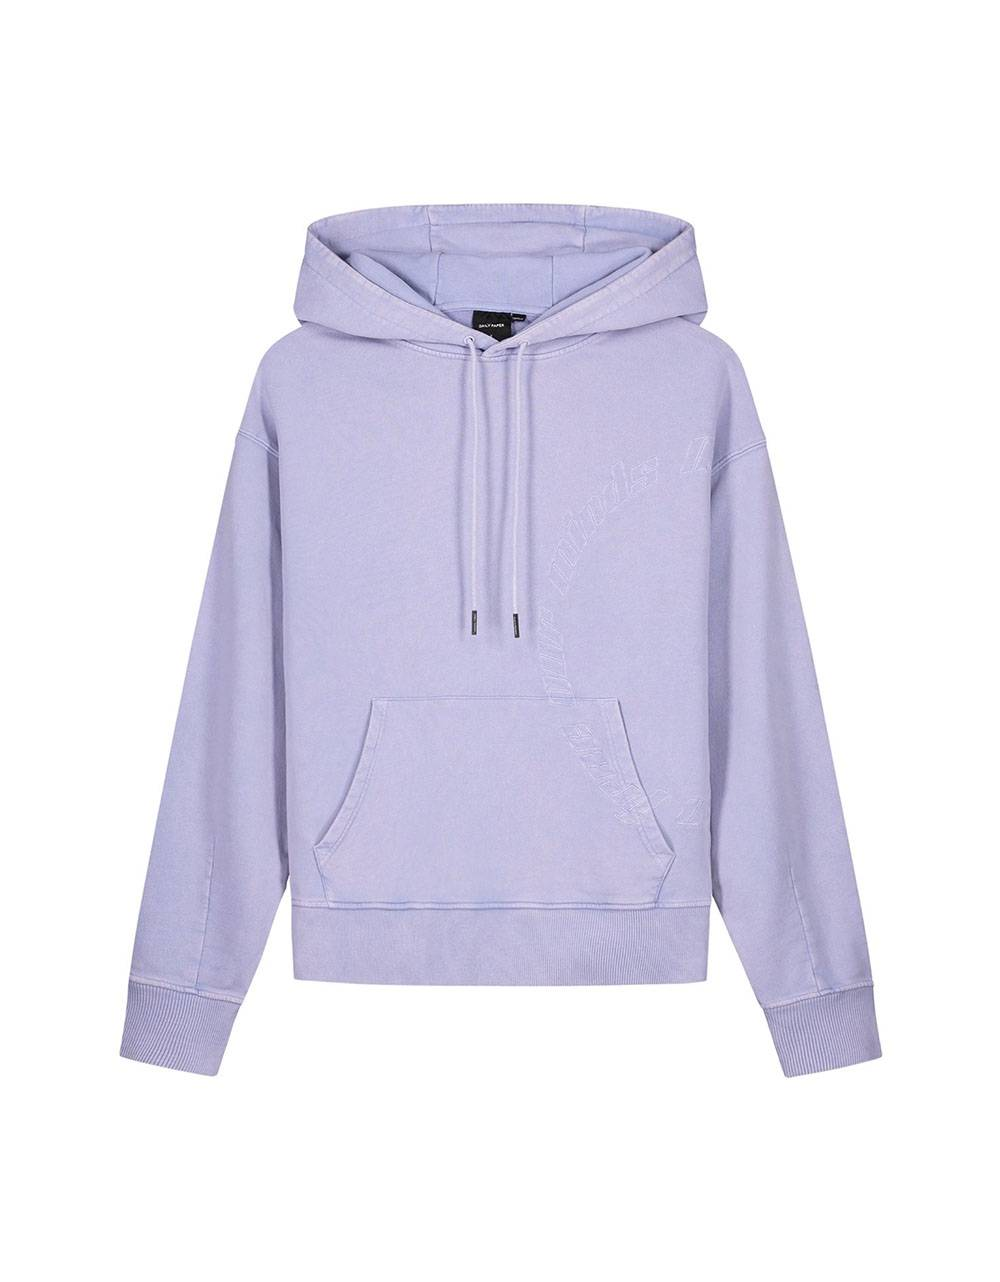 Daily Paper Kalcid hoodie - jacaranda purple DAILY PAPER Sweater 156,00€